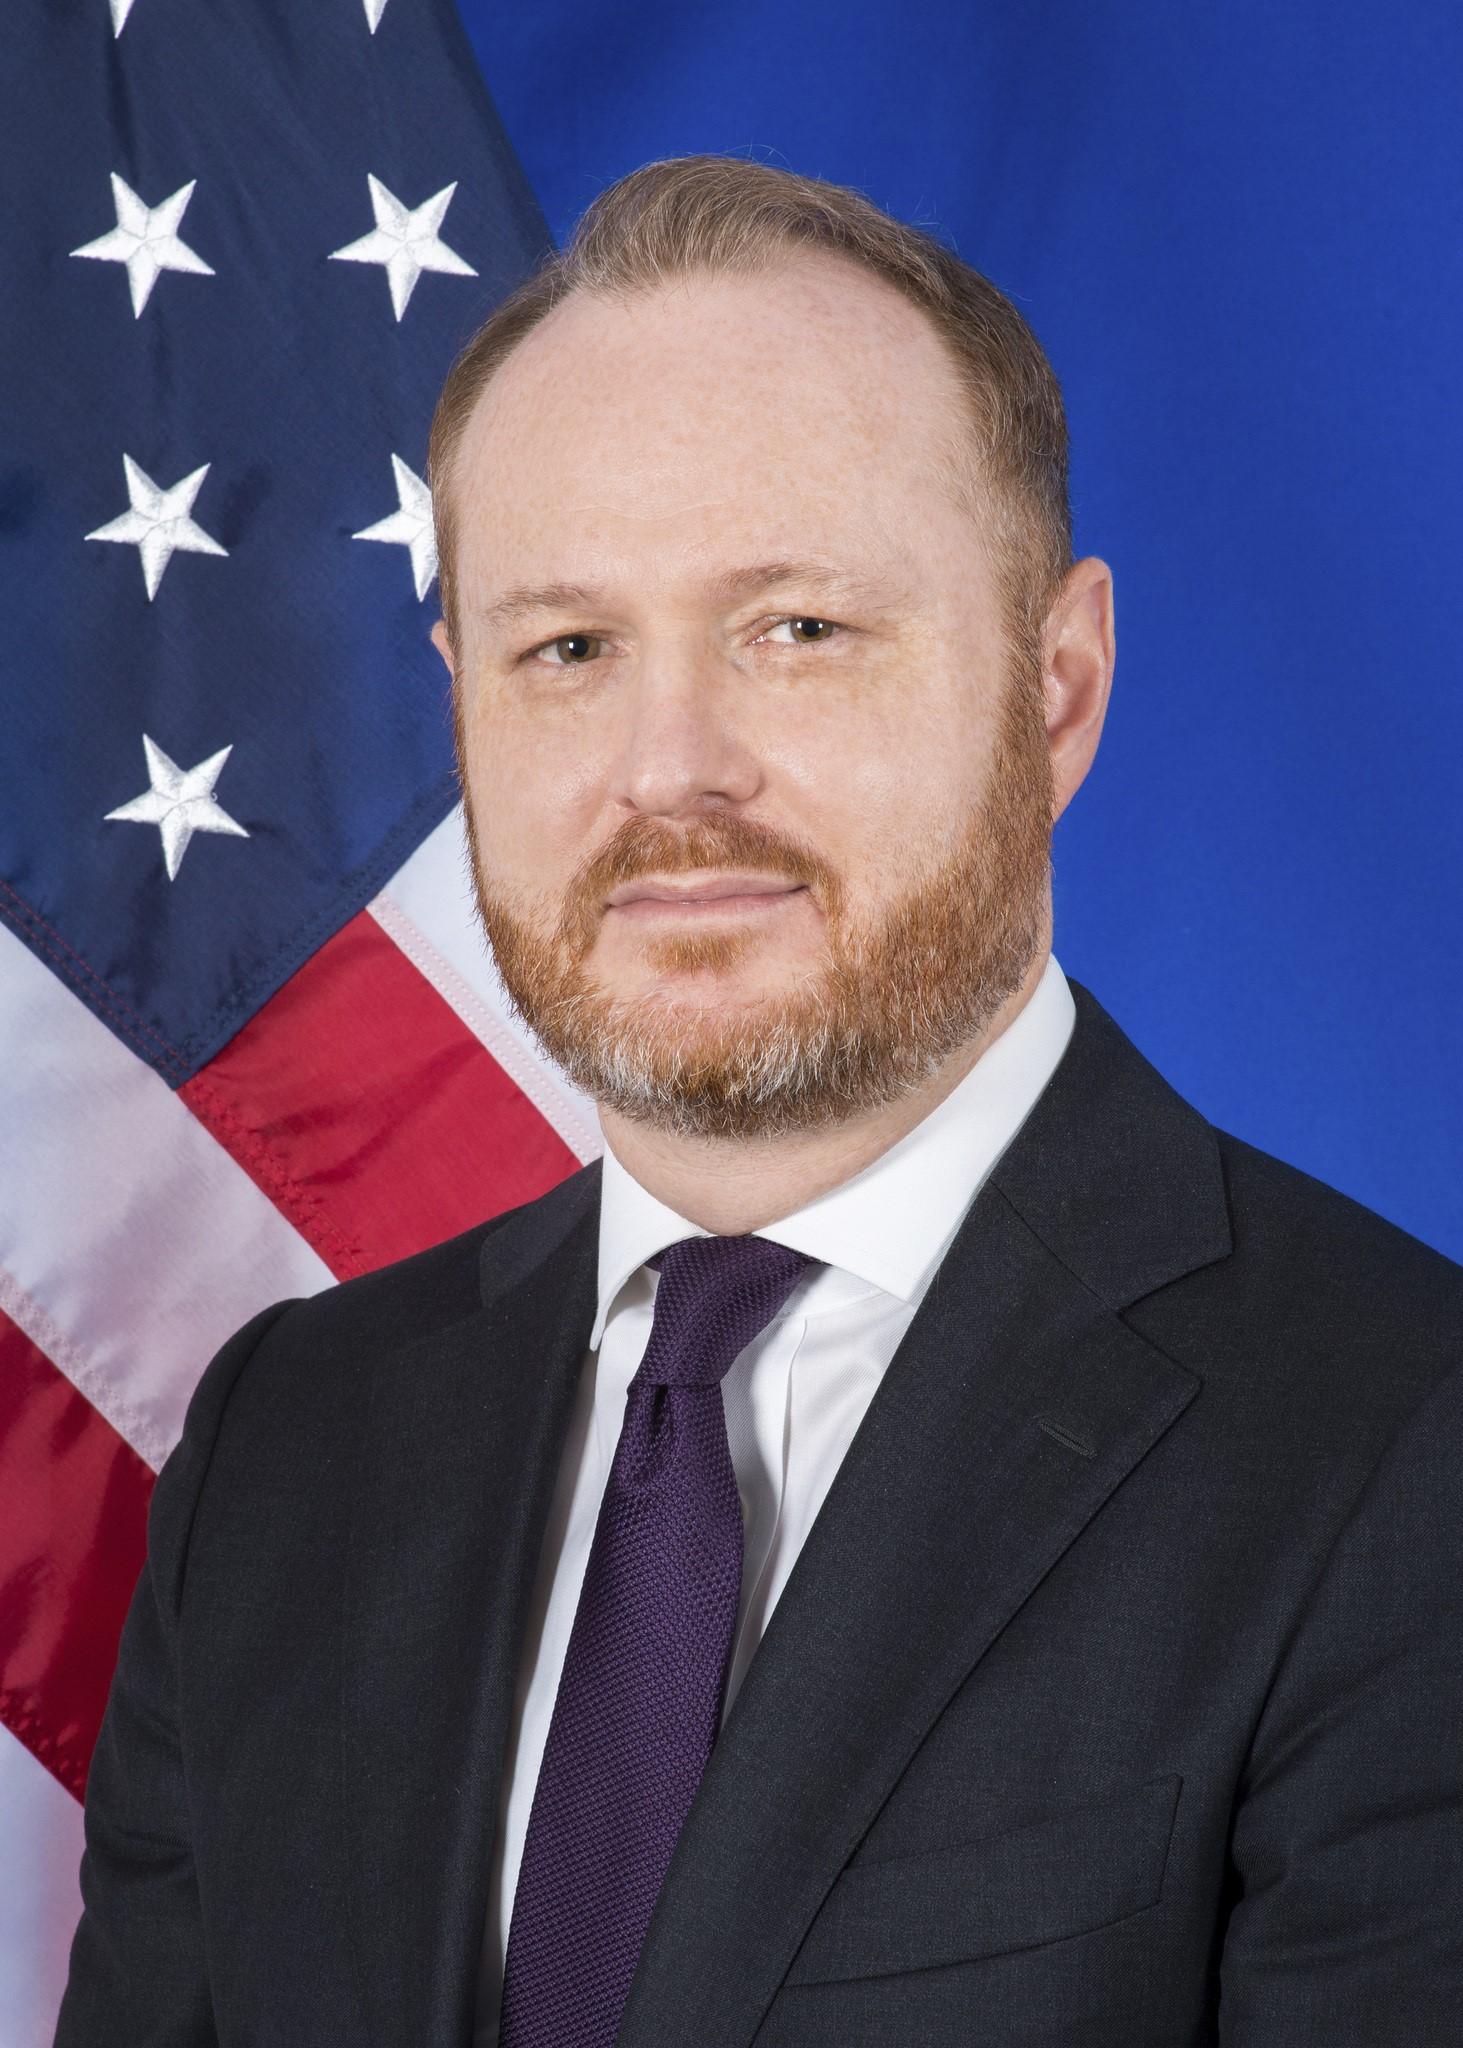 John T. Godfrey, Deputy Coordinator for Regional and Multilateral Affairs